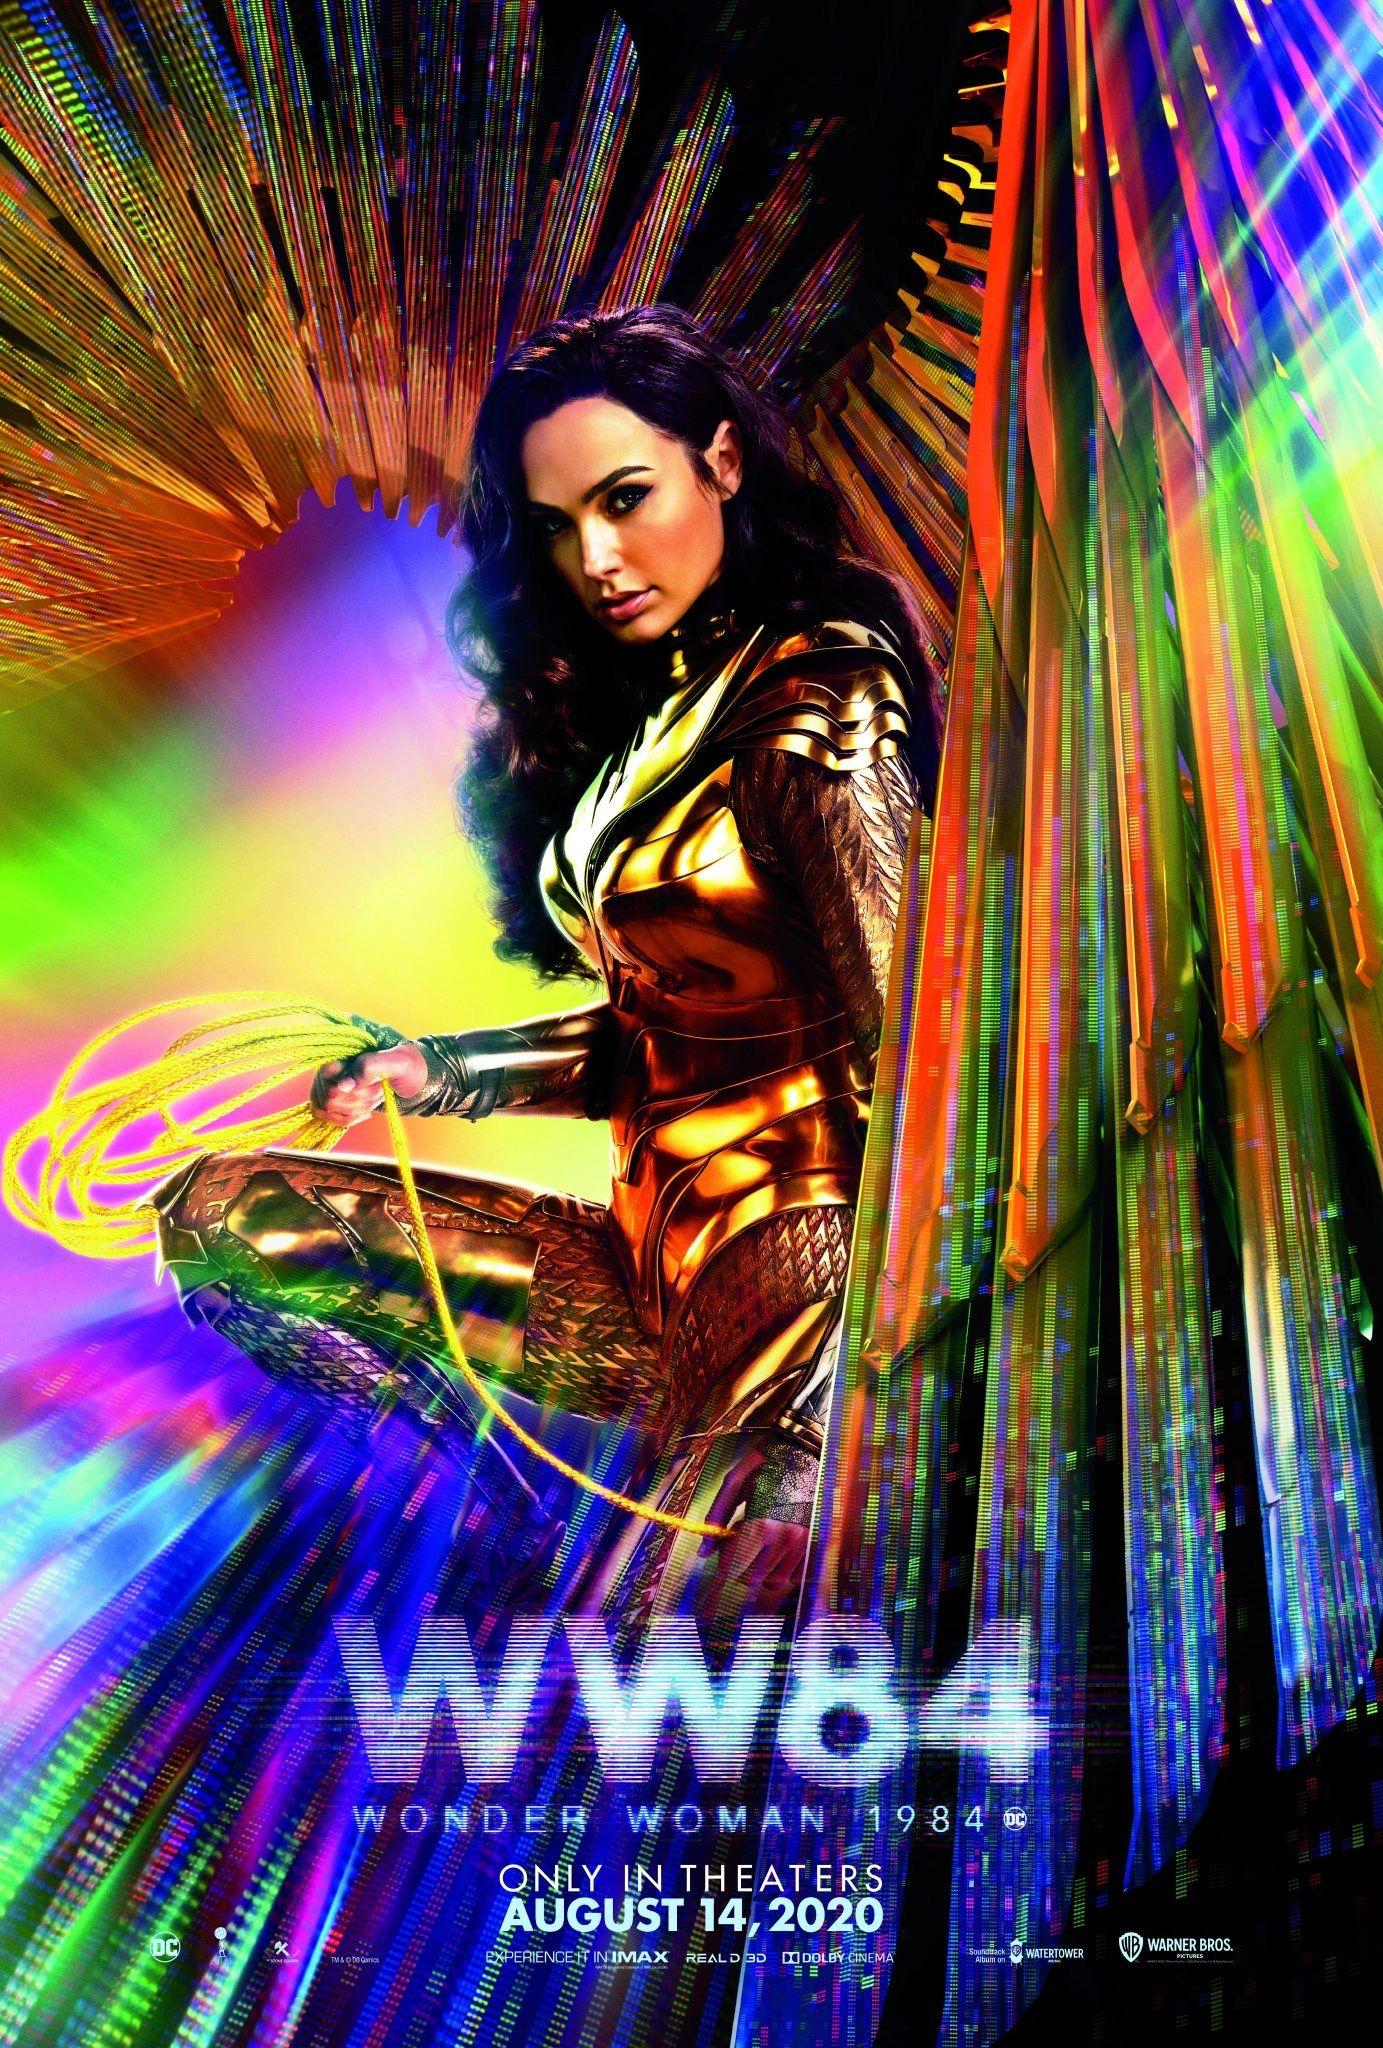 Pin De Lorena Gimenez En Wonder Woman Peliculas De Superheroes Peliculas Fantasia Mujer Maravilla Comic